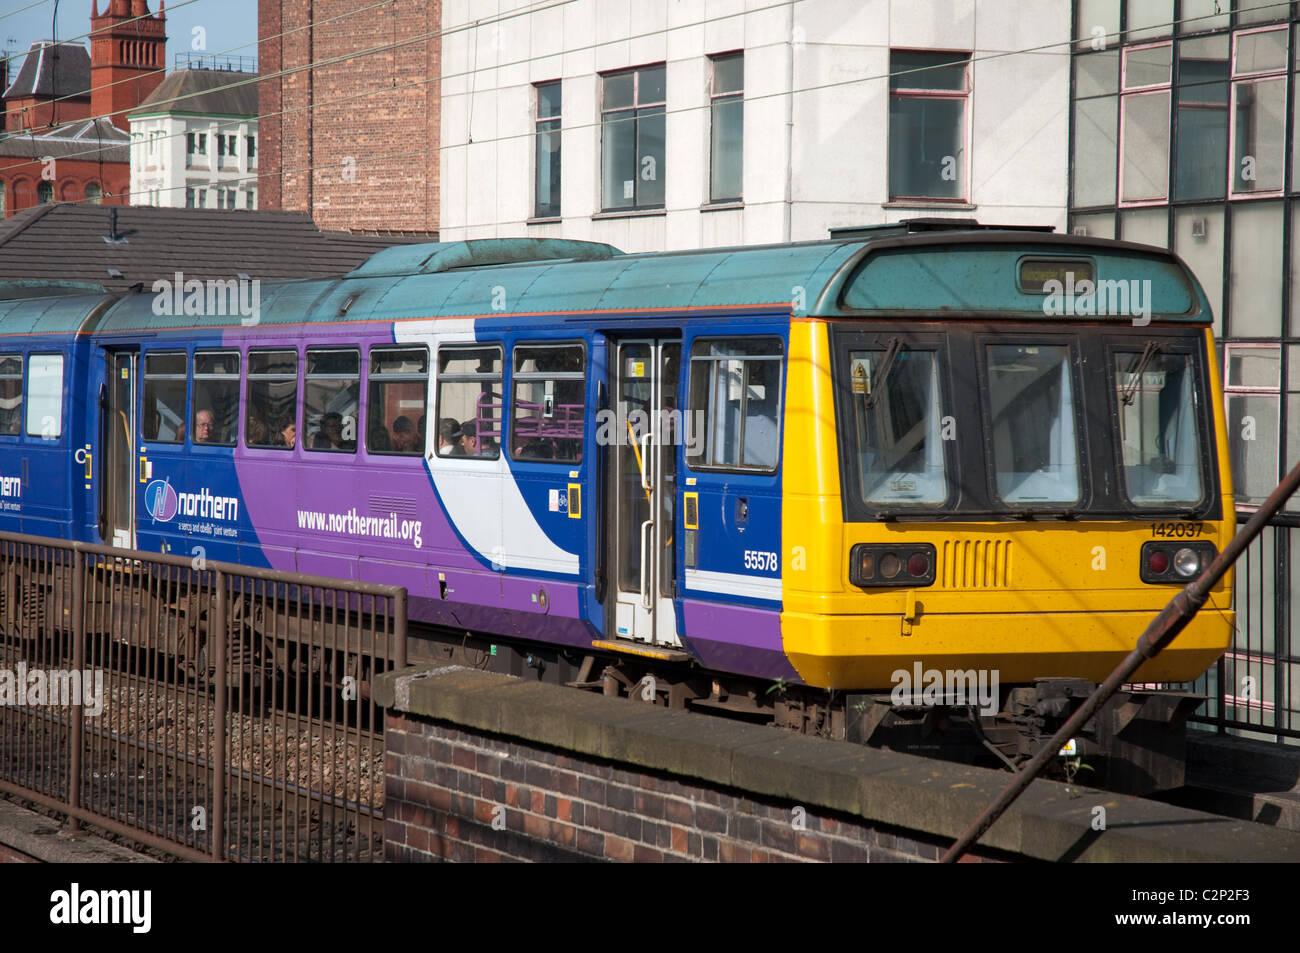 Northern Rail train city centre Manchester - Stock Image